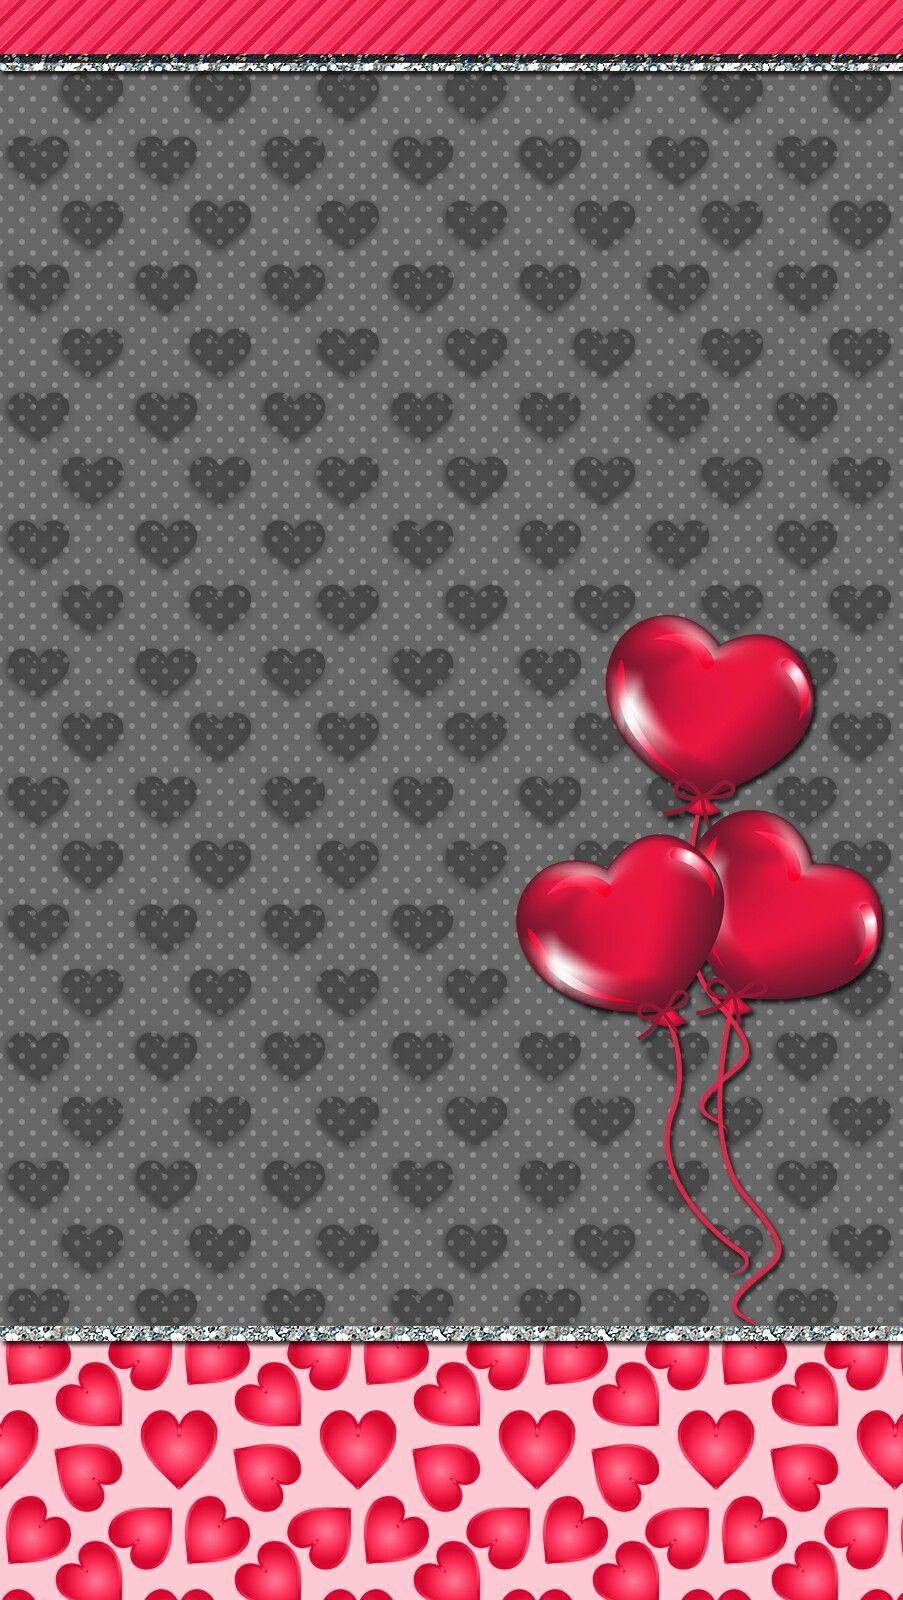 Valentine S Day Wallpaper Iphone Heart Wallpaper Valentines Wallpaper Valentines Wallpaper Iphone